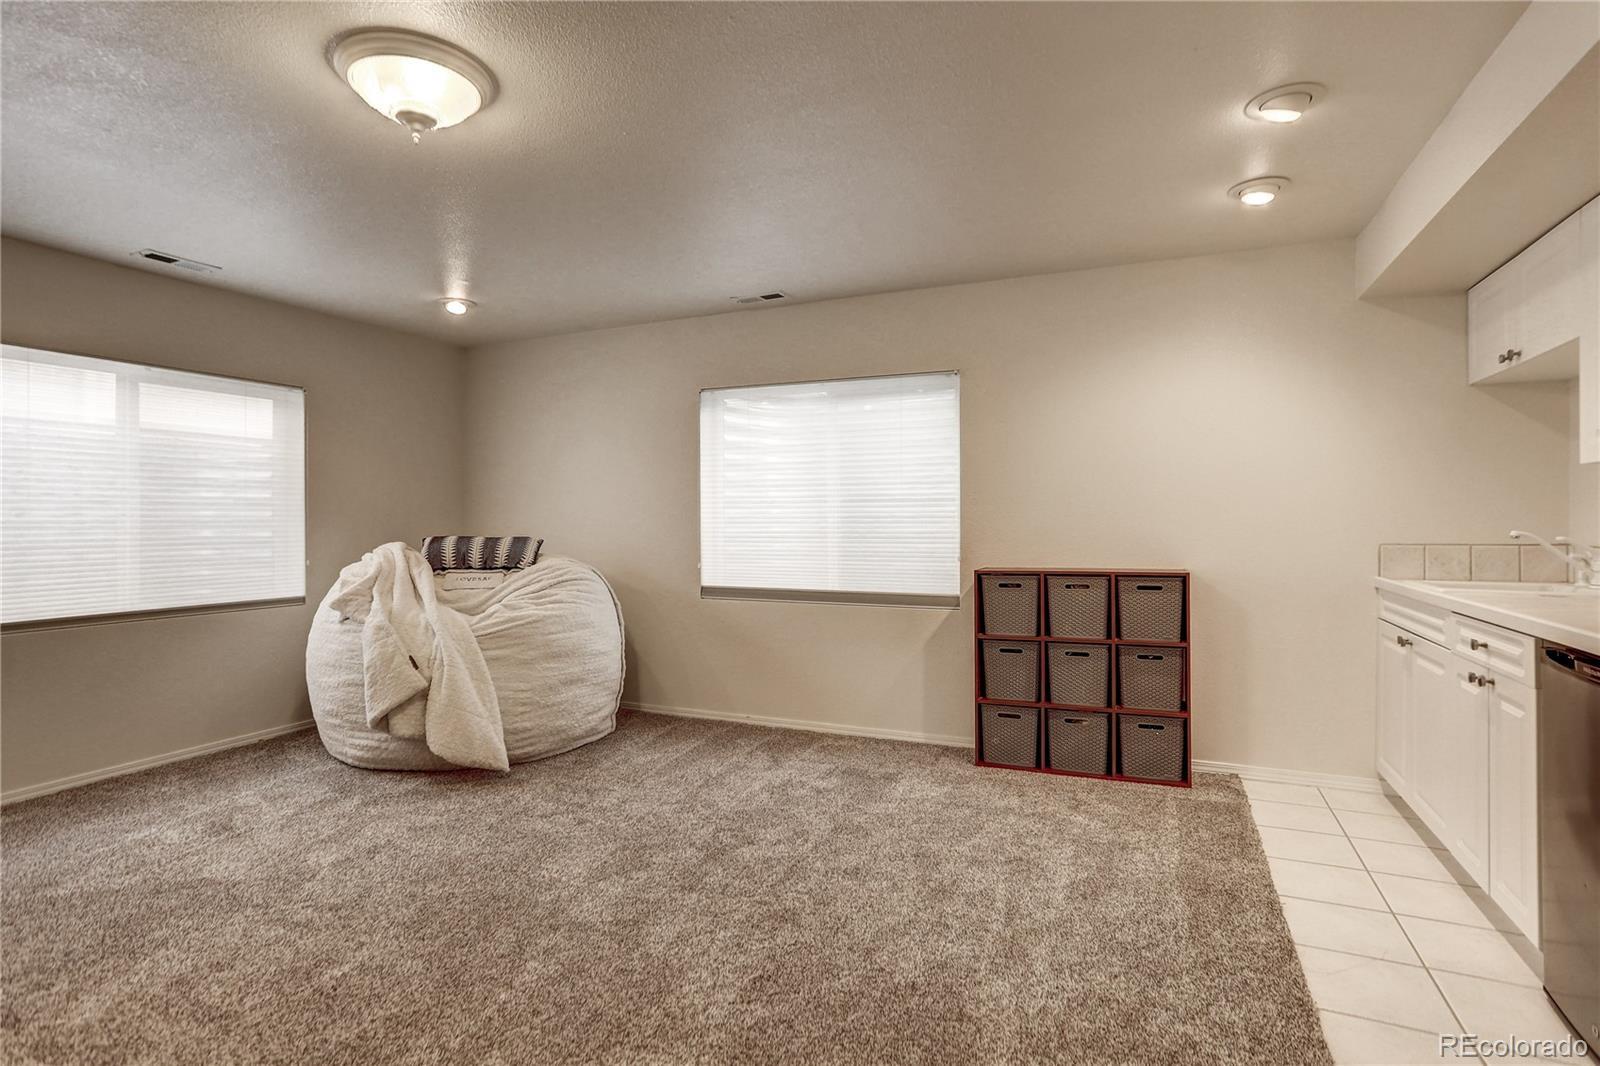 MLS# 9497145 - 22 - 4960 Squirreltail Drive, Colorado Springs, CO 80920